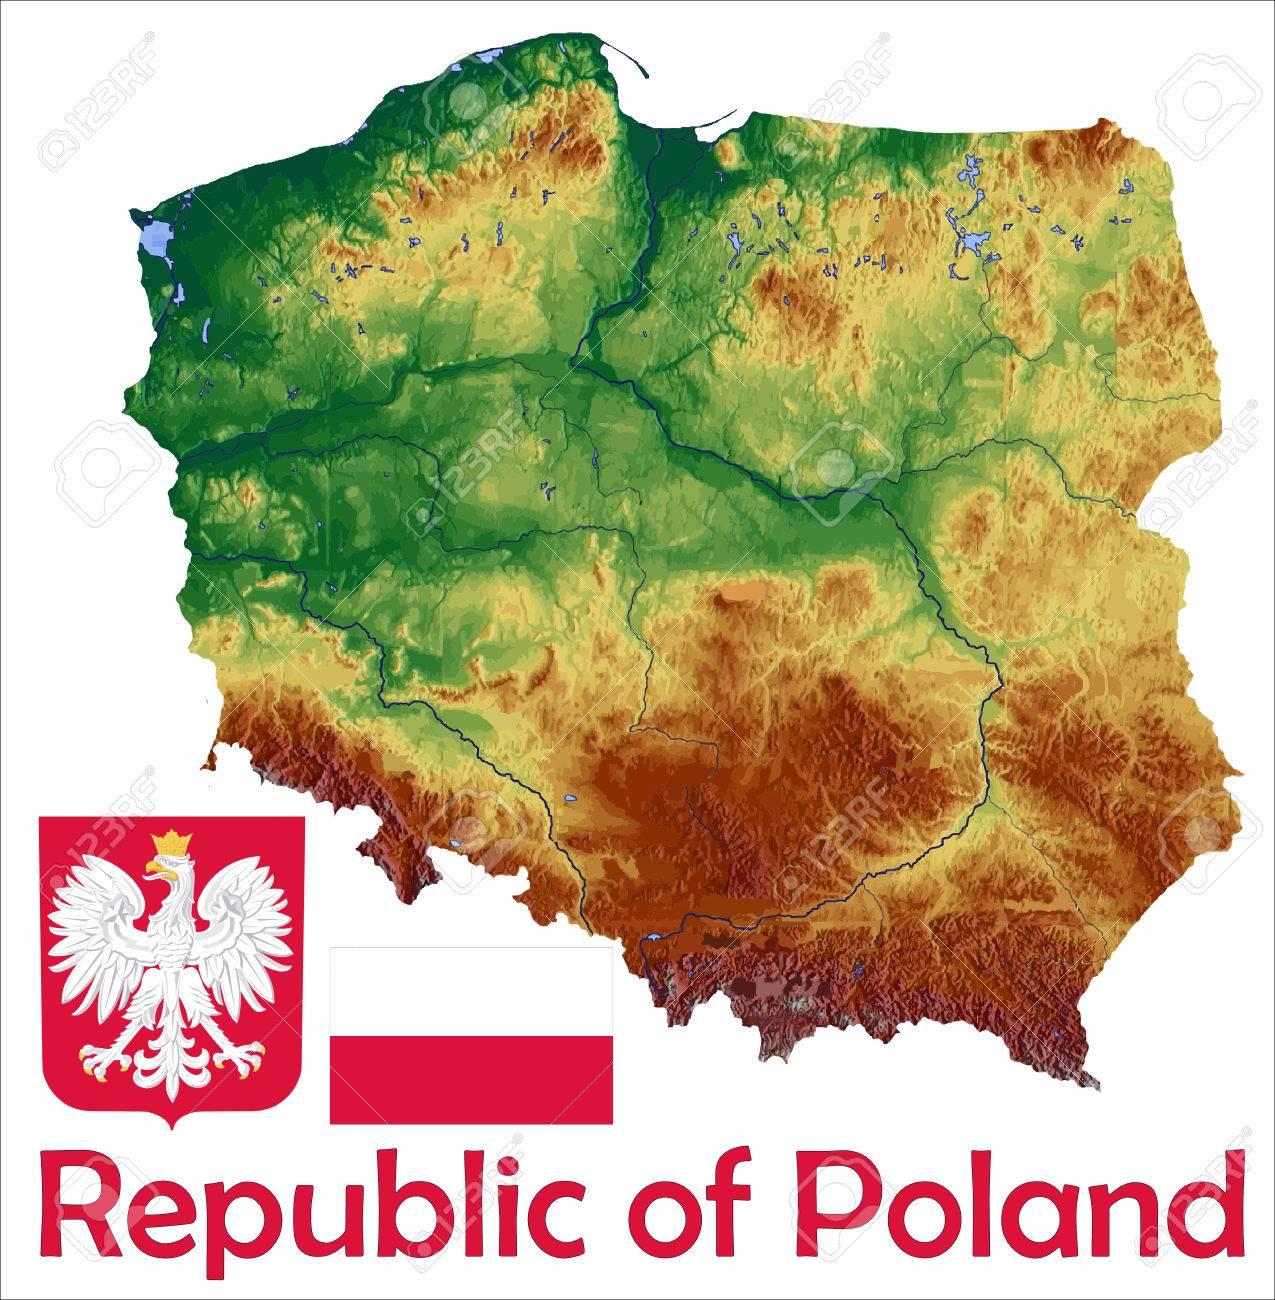 Poland Map Flag Coat Royalty Free Cliparts, Vectors, And Stock ...